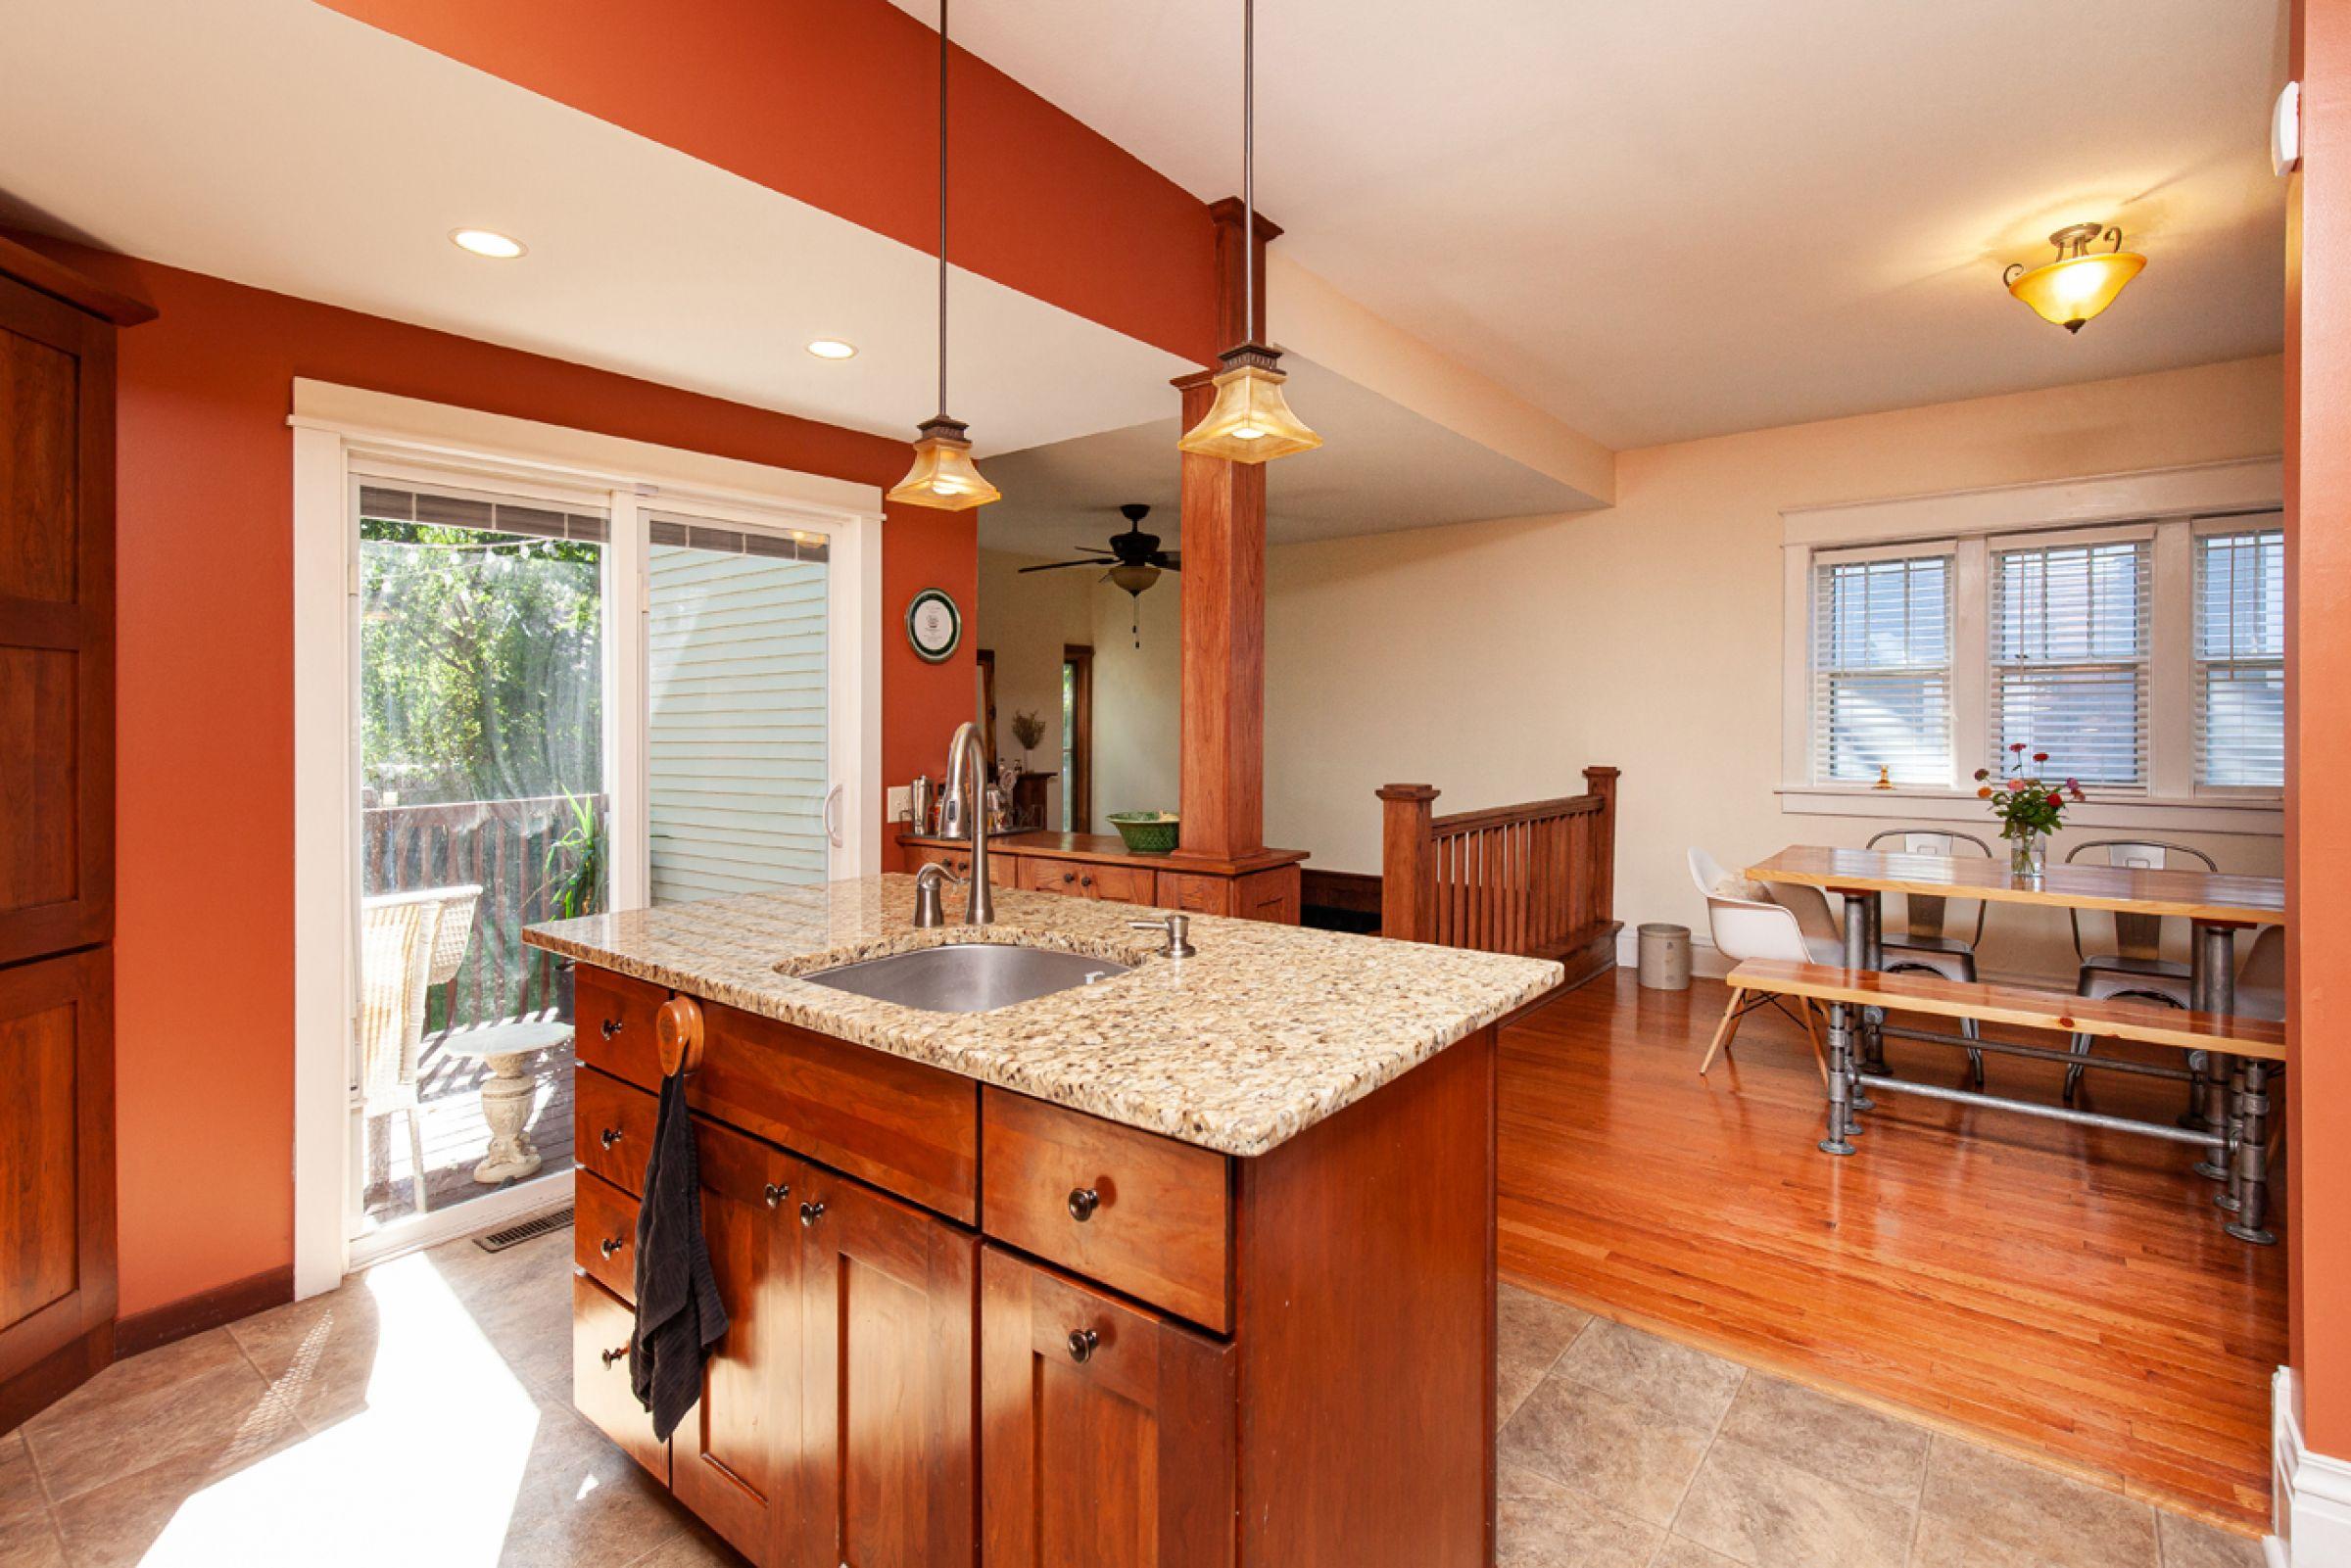 residential-polk-county-iowa-0-acres-listing-number-15153-3-2020-09-02-232110.jpg